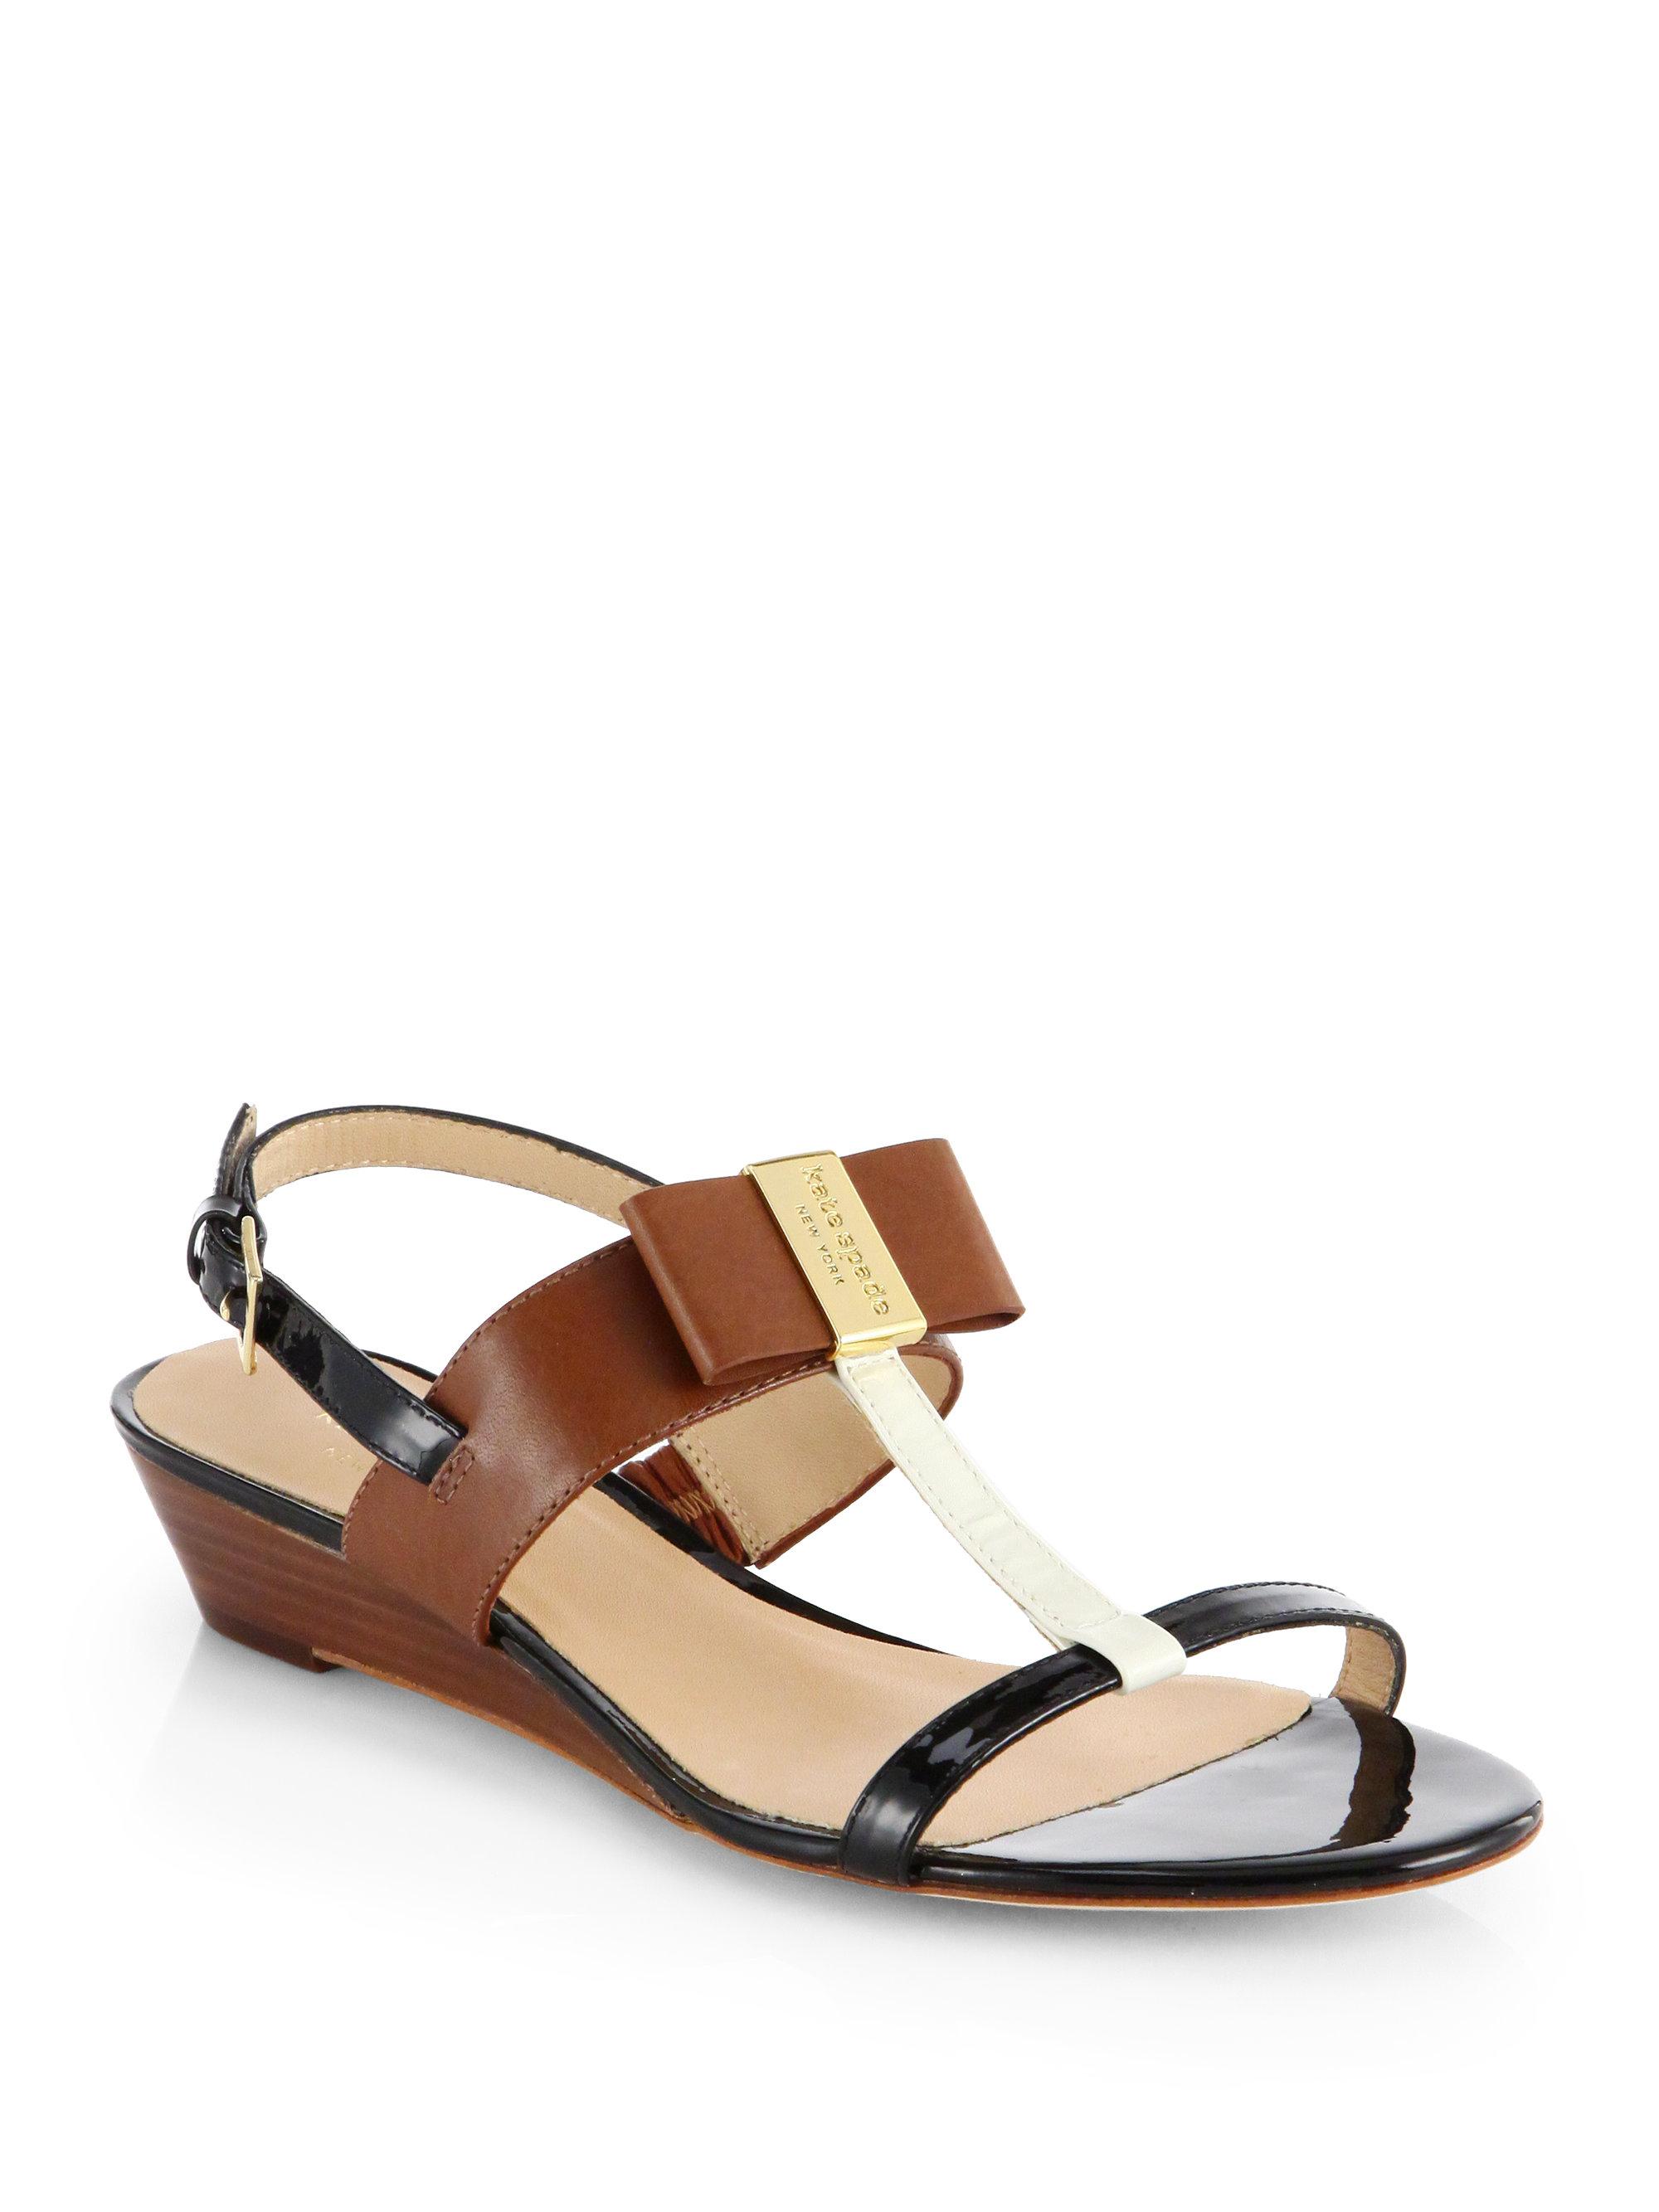 Kate Spade Vinny Leather T Strap Wedge Sandals In Black